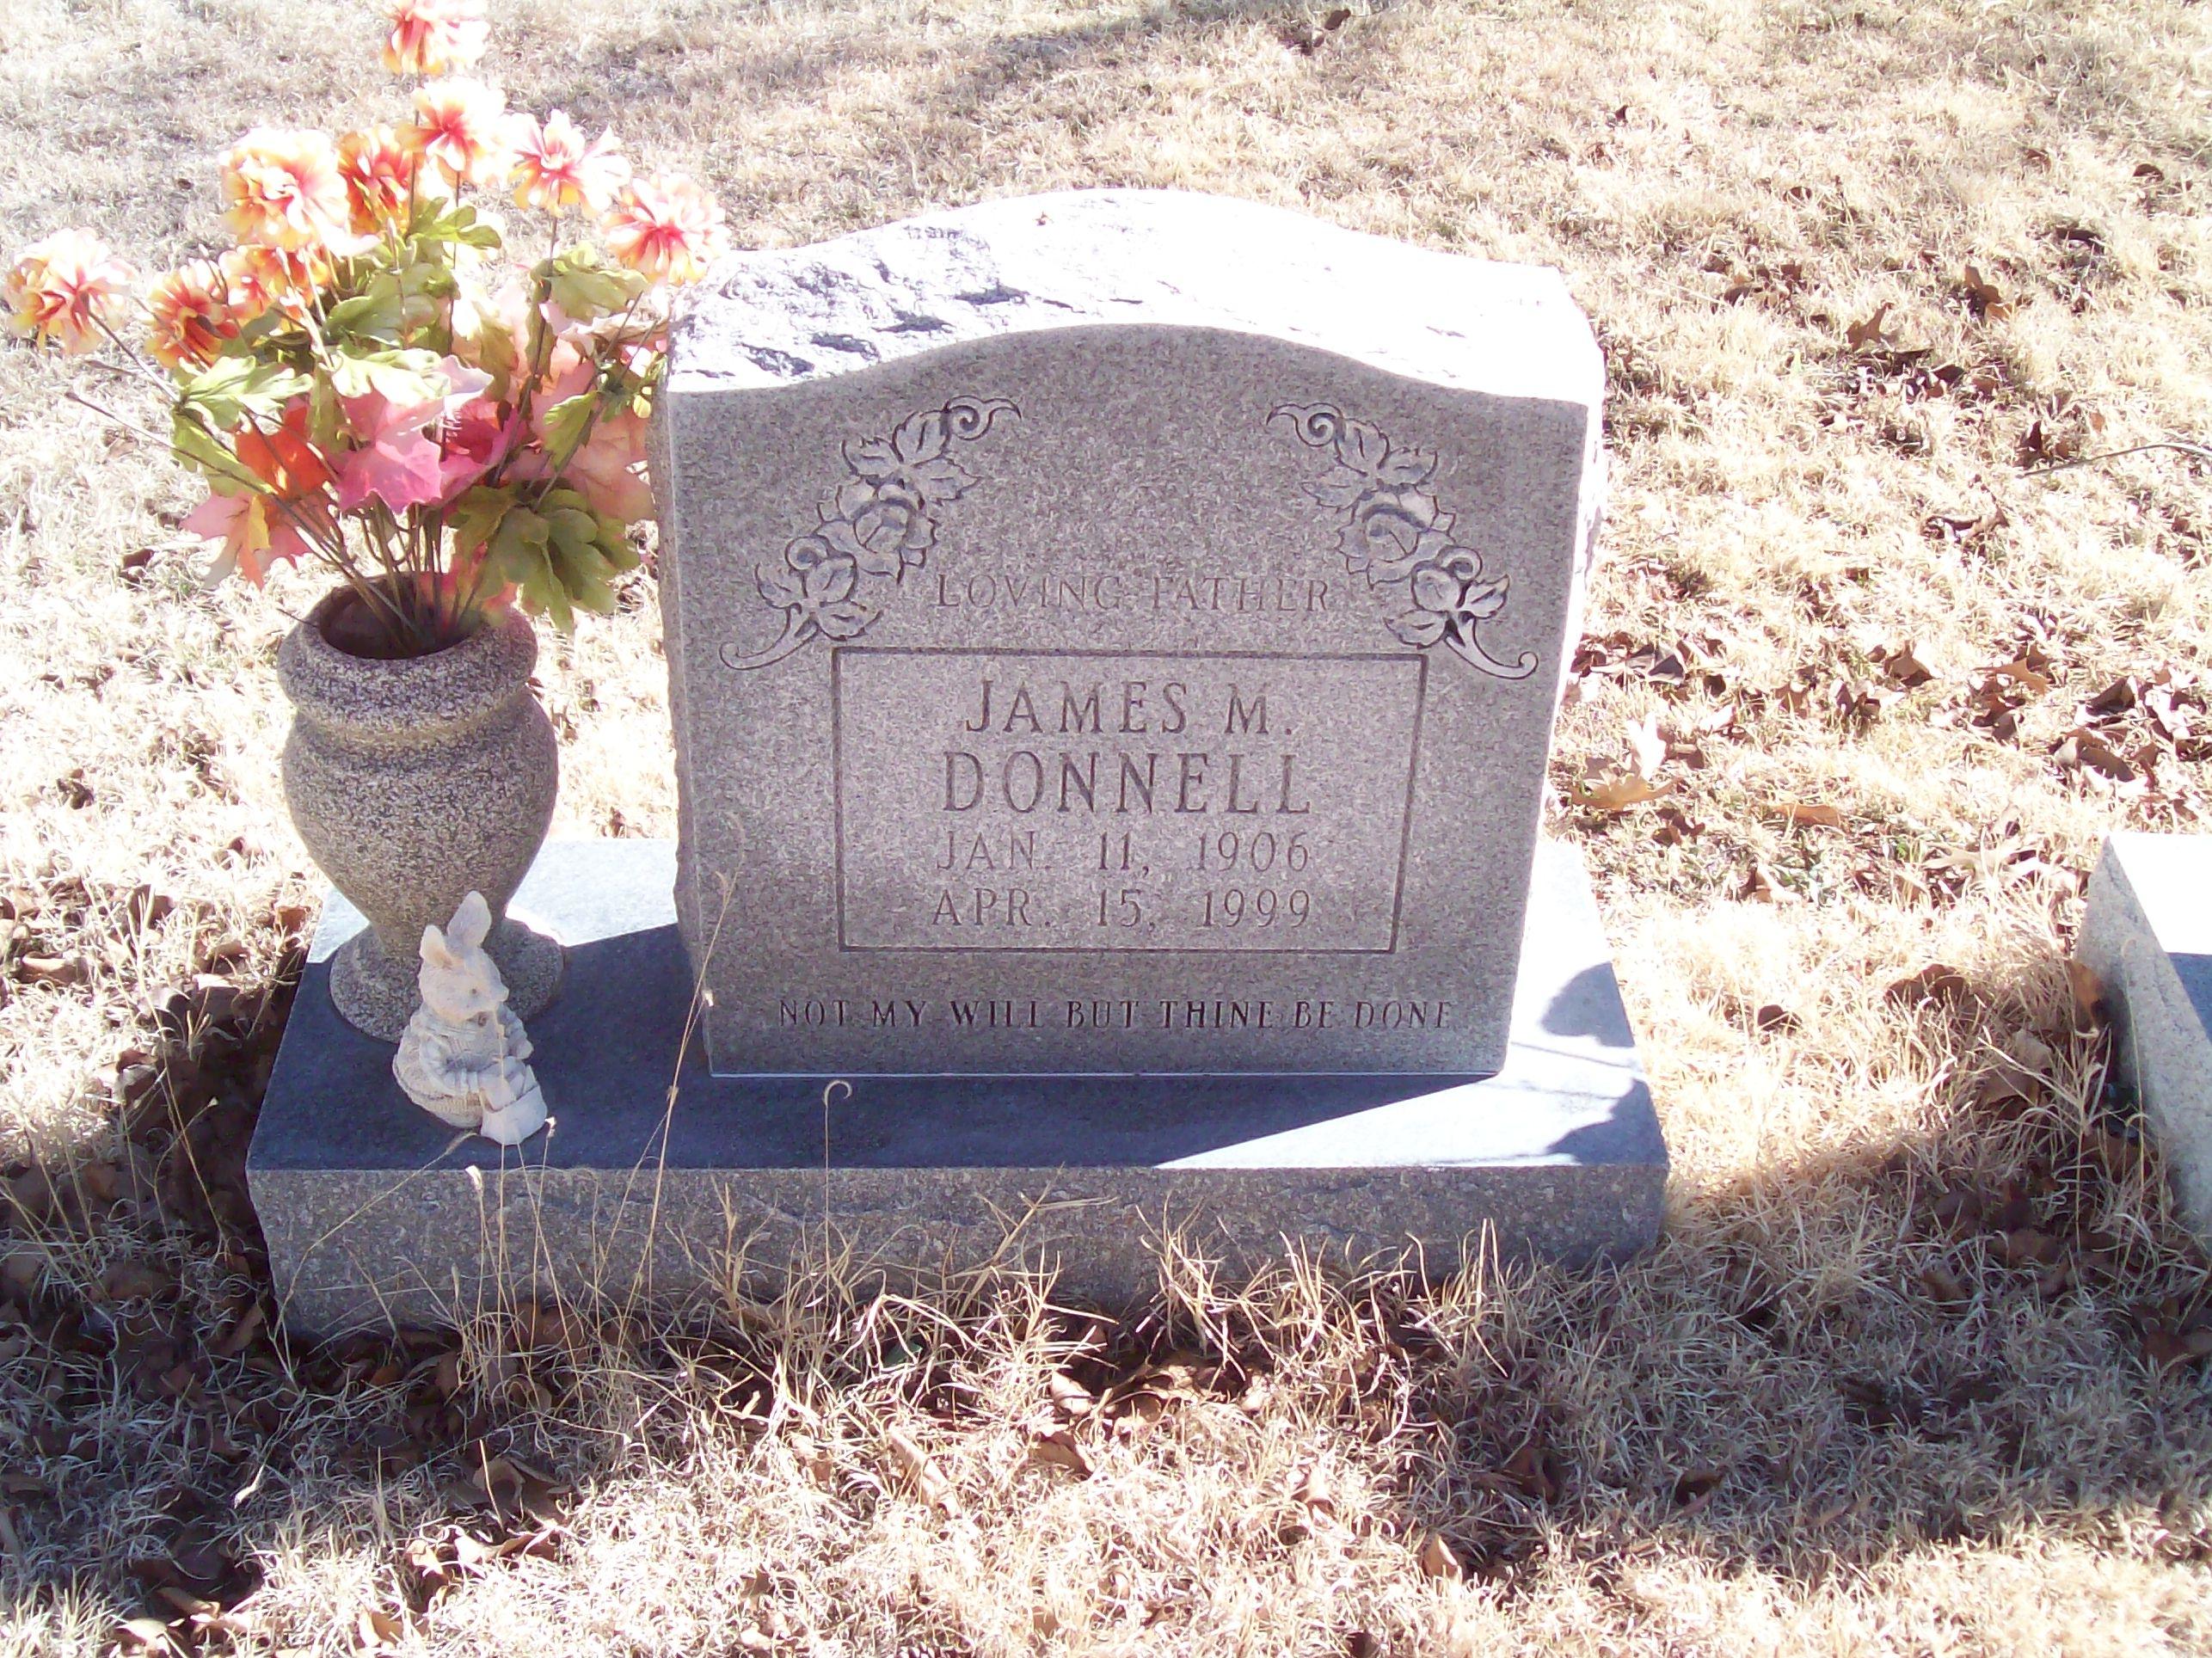 James M. Mack Donnell